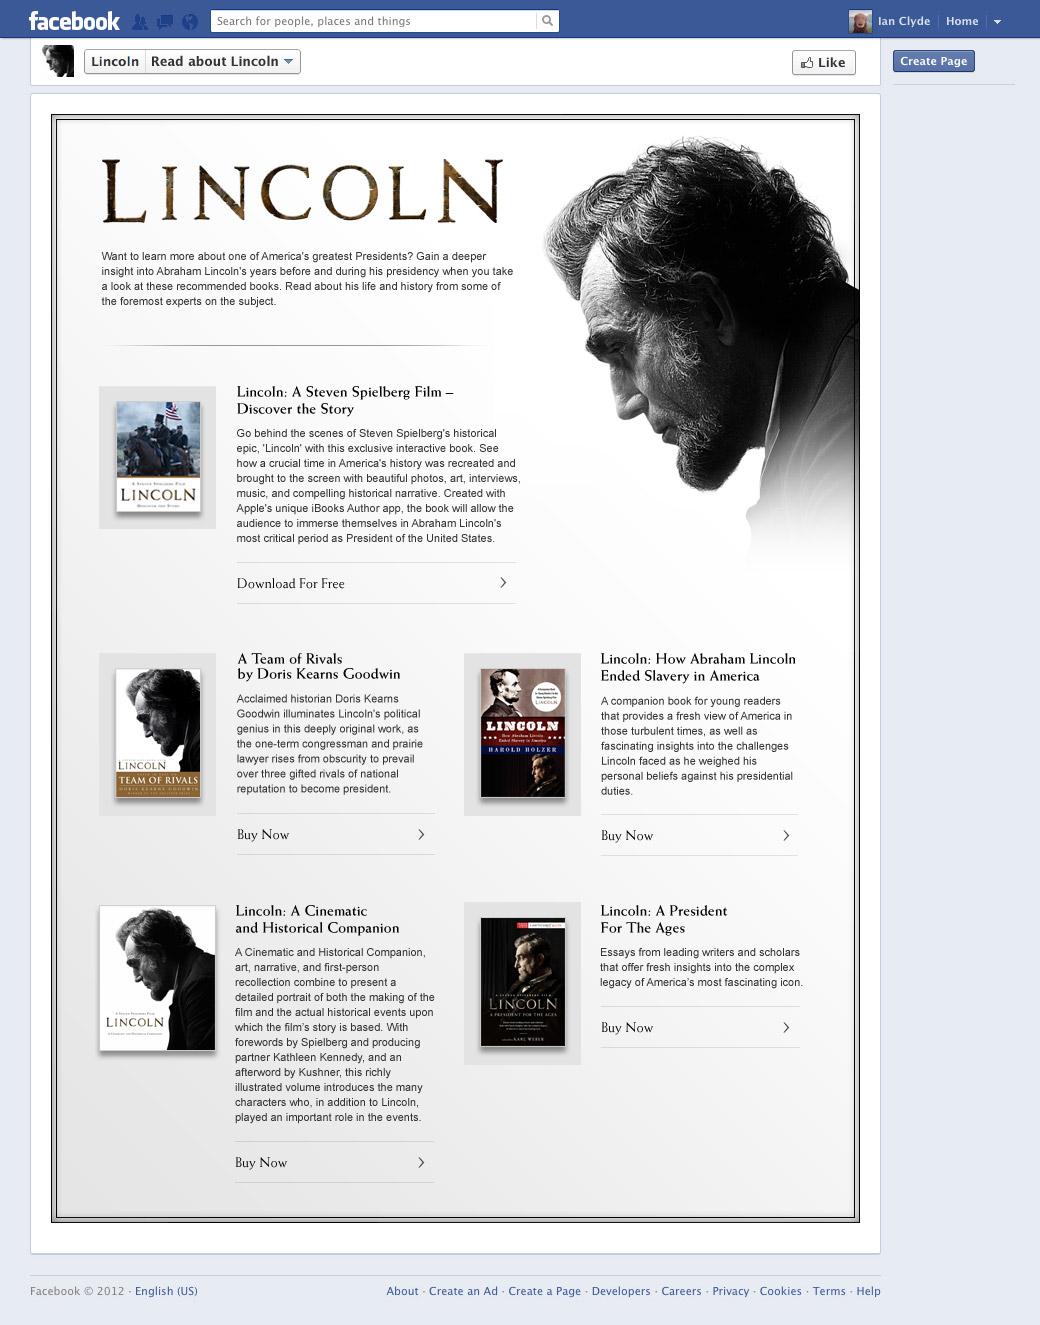 Lincoln_FB_12_6.jpg